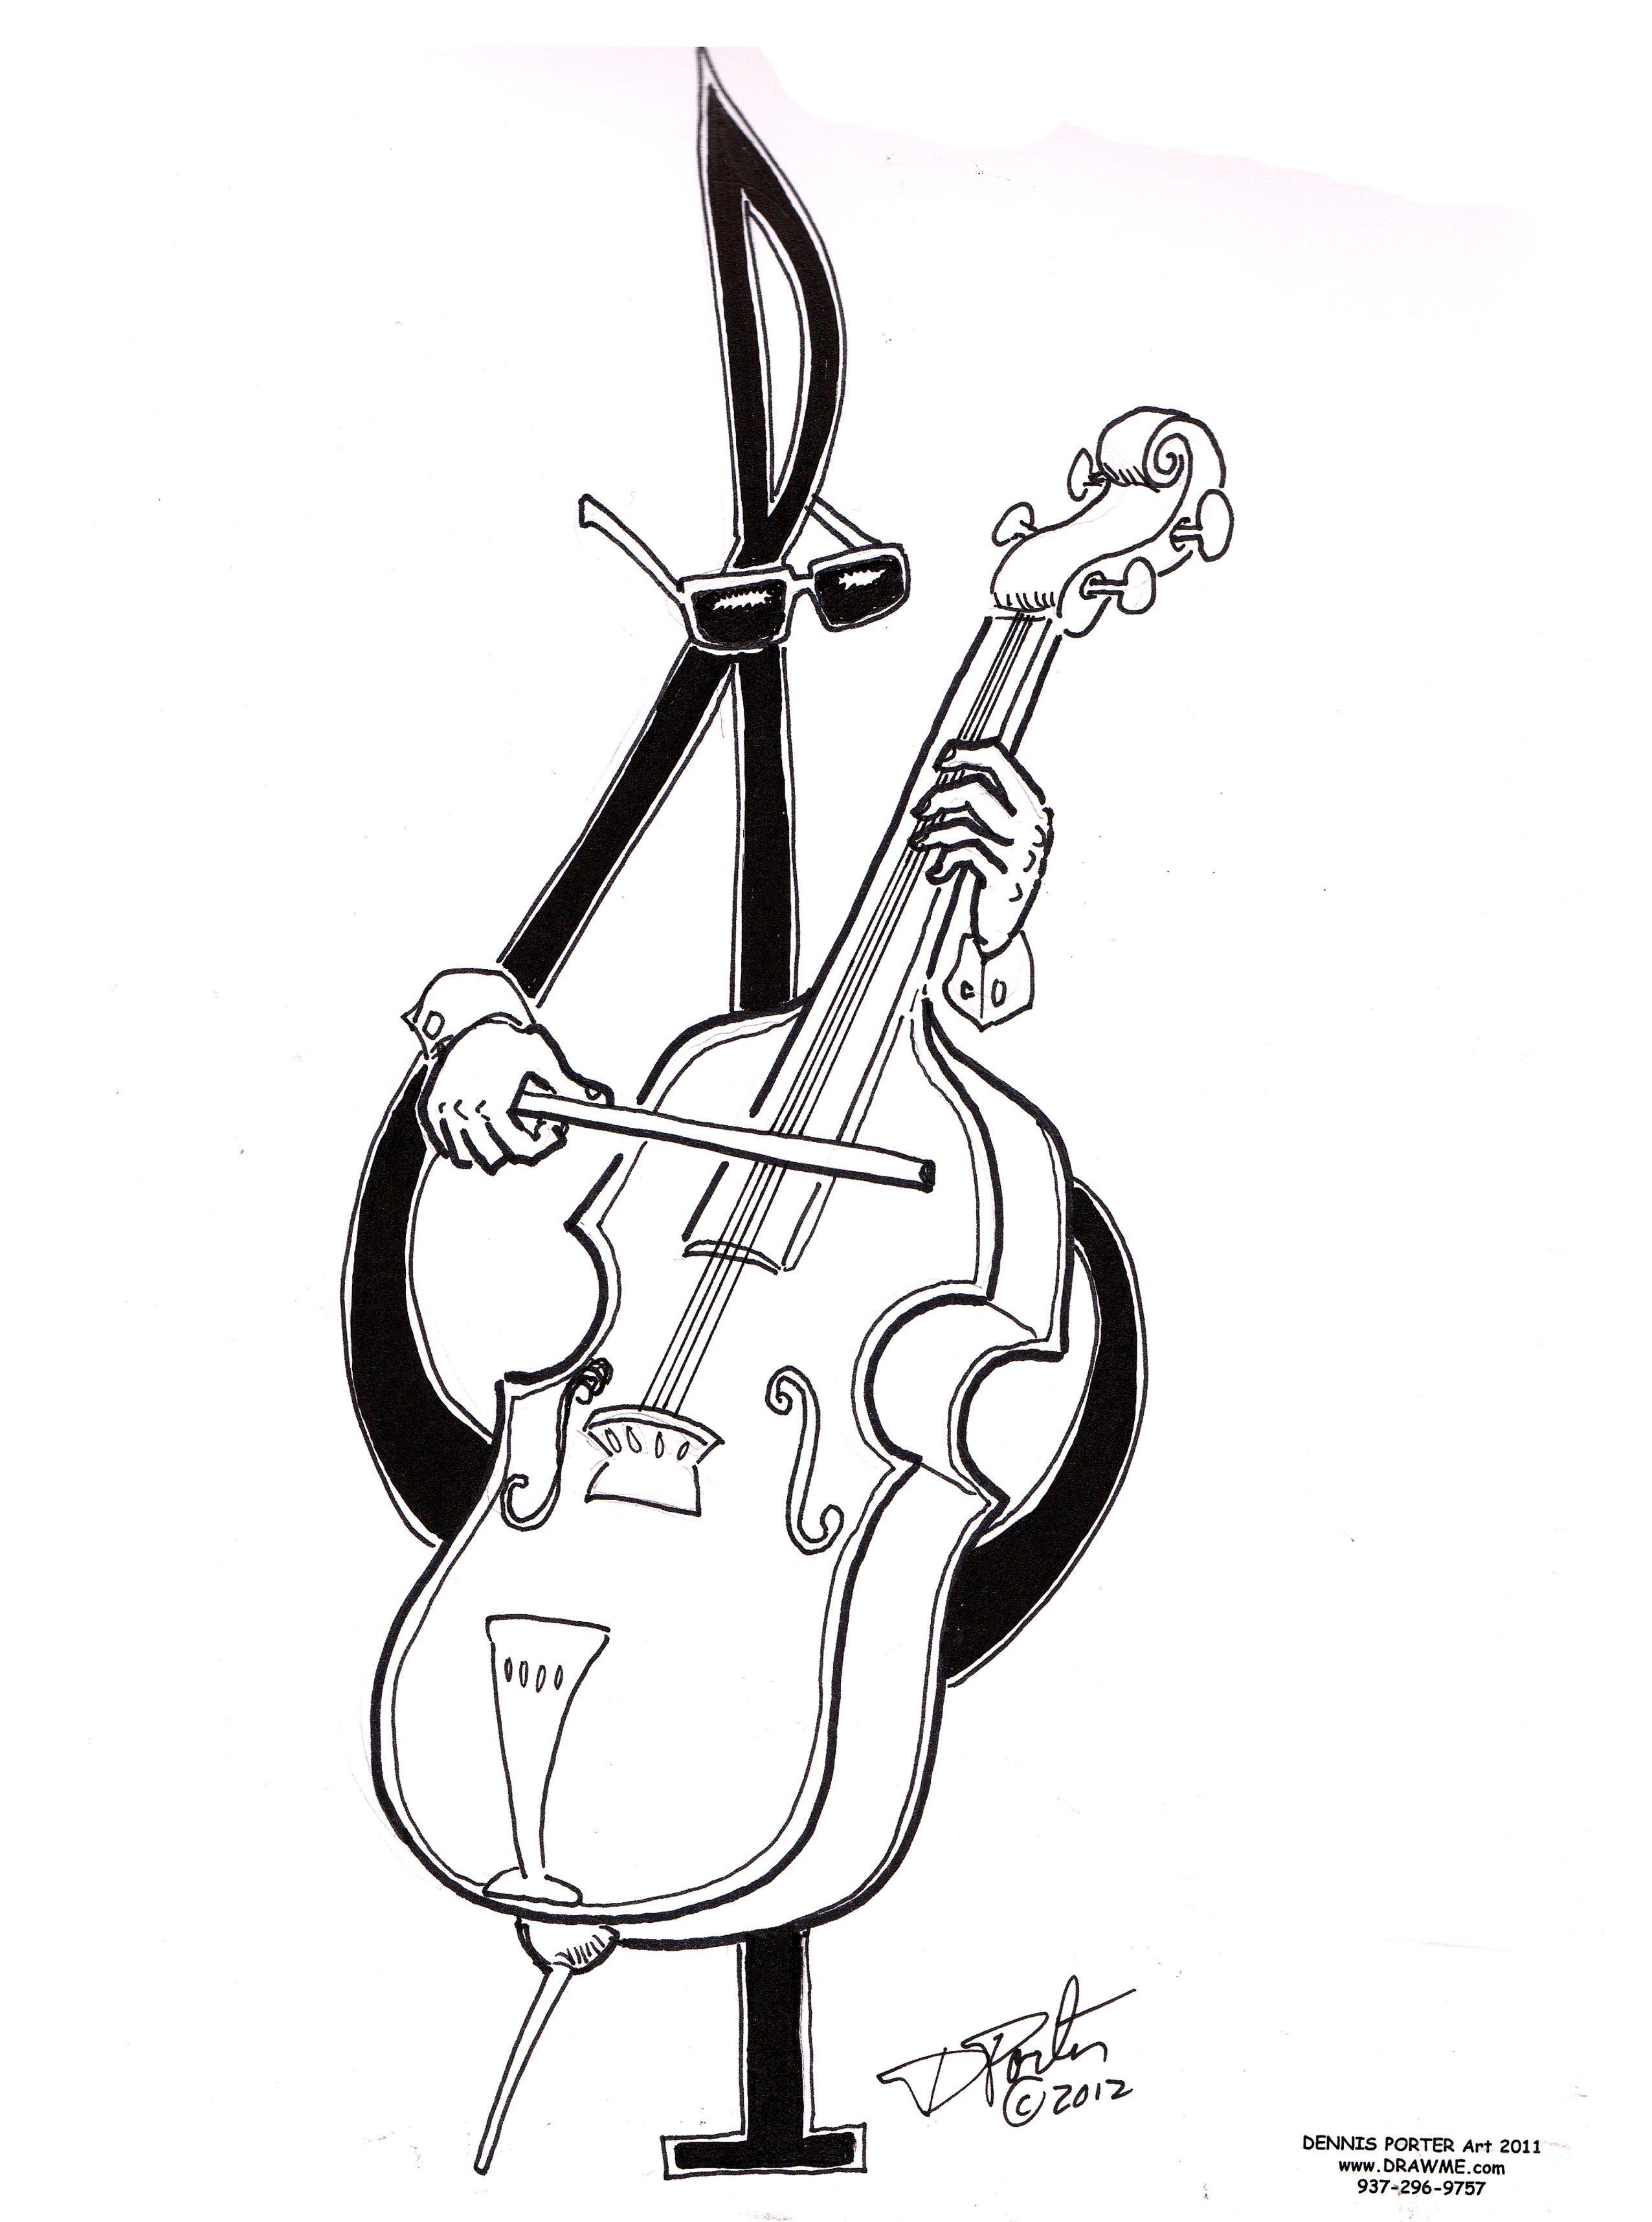 Beautiful Cello G Clef With Images Tatuaze Muzyka